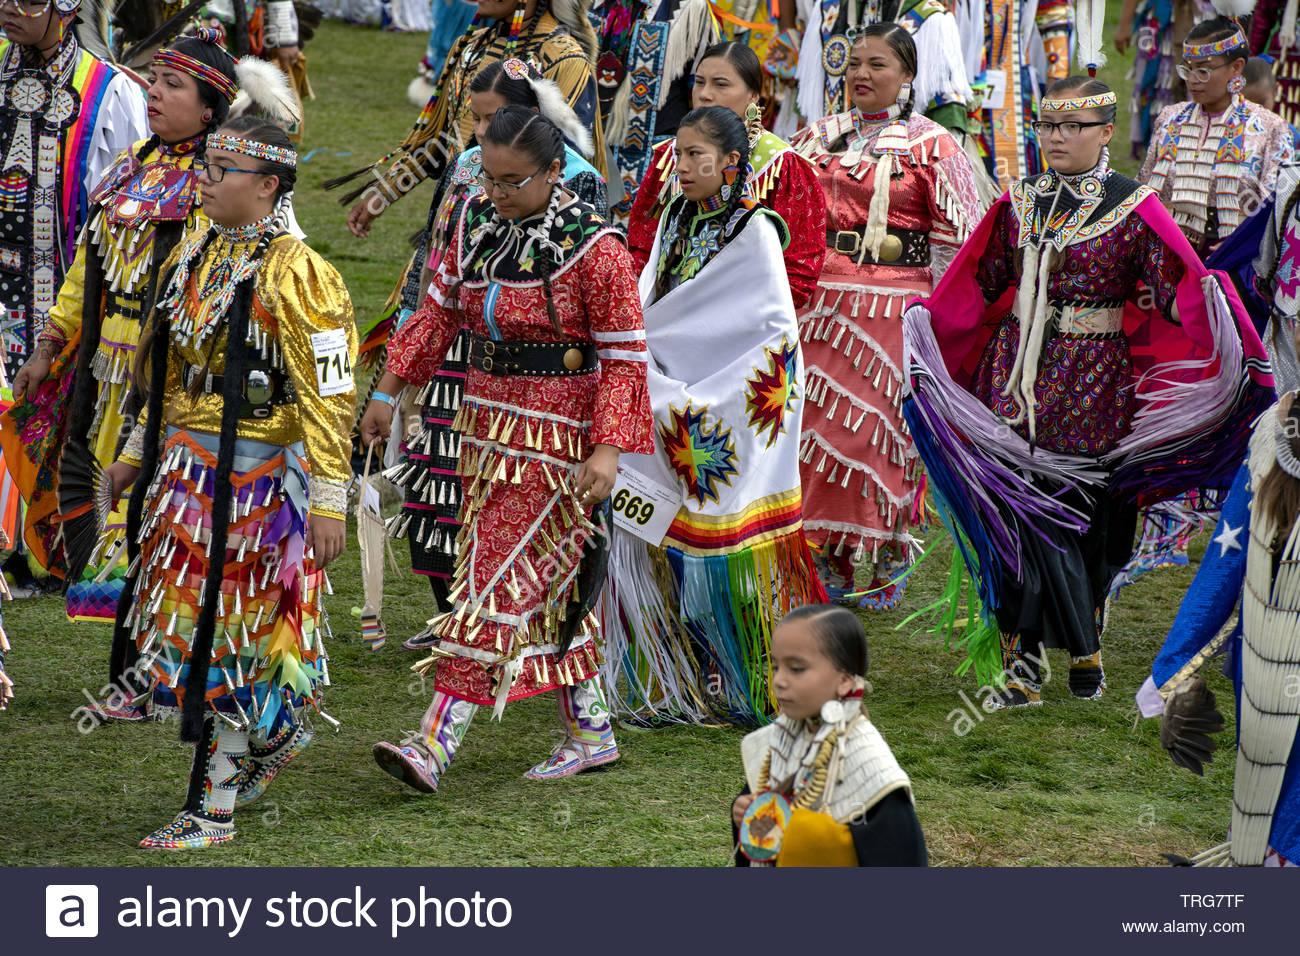 sioux, united tribes technical college international pow wow, bismarck, north dakota, usa - Stock Image